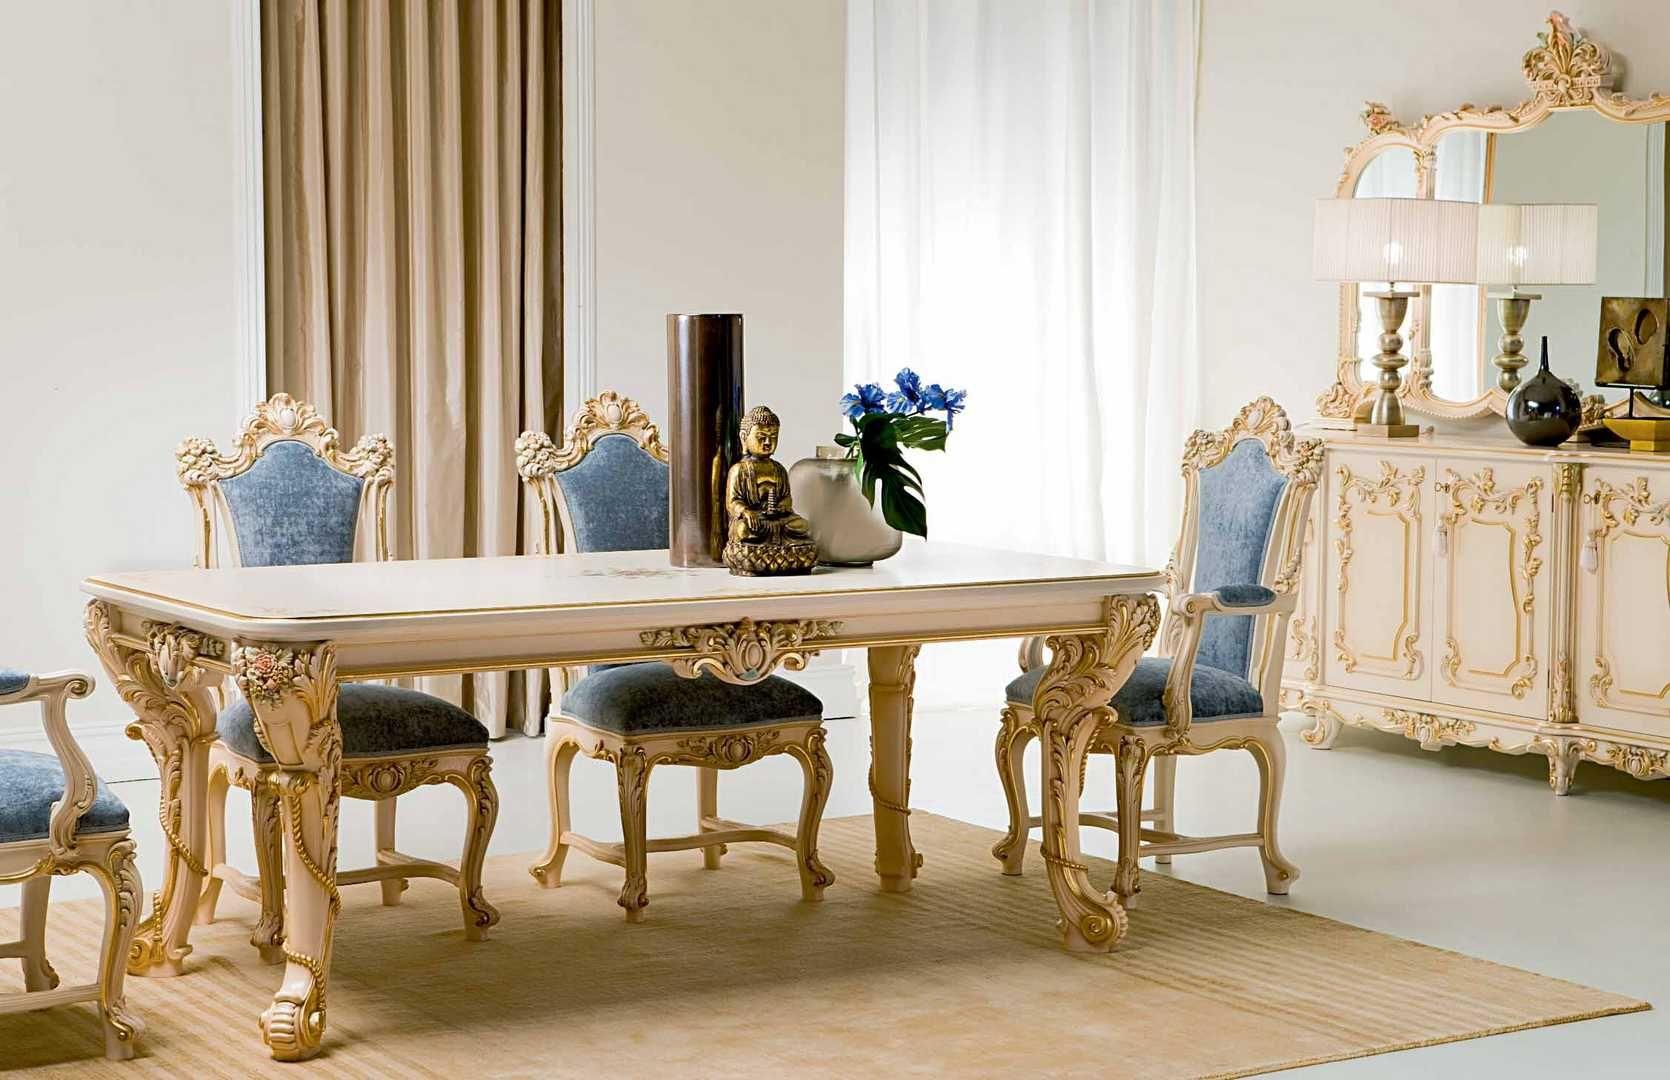 furniture in italian. Furniture In Italian. Luxury+italian+furniture | Home Italian Furnitures Alexandra Mondital Luxury